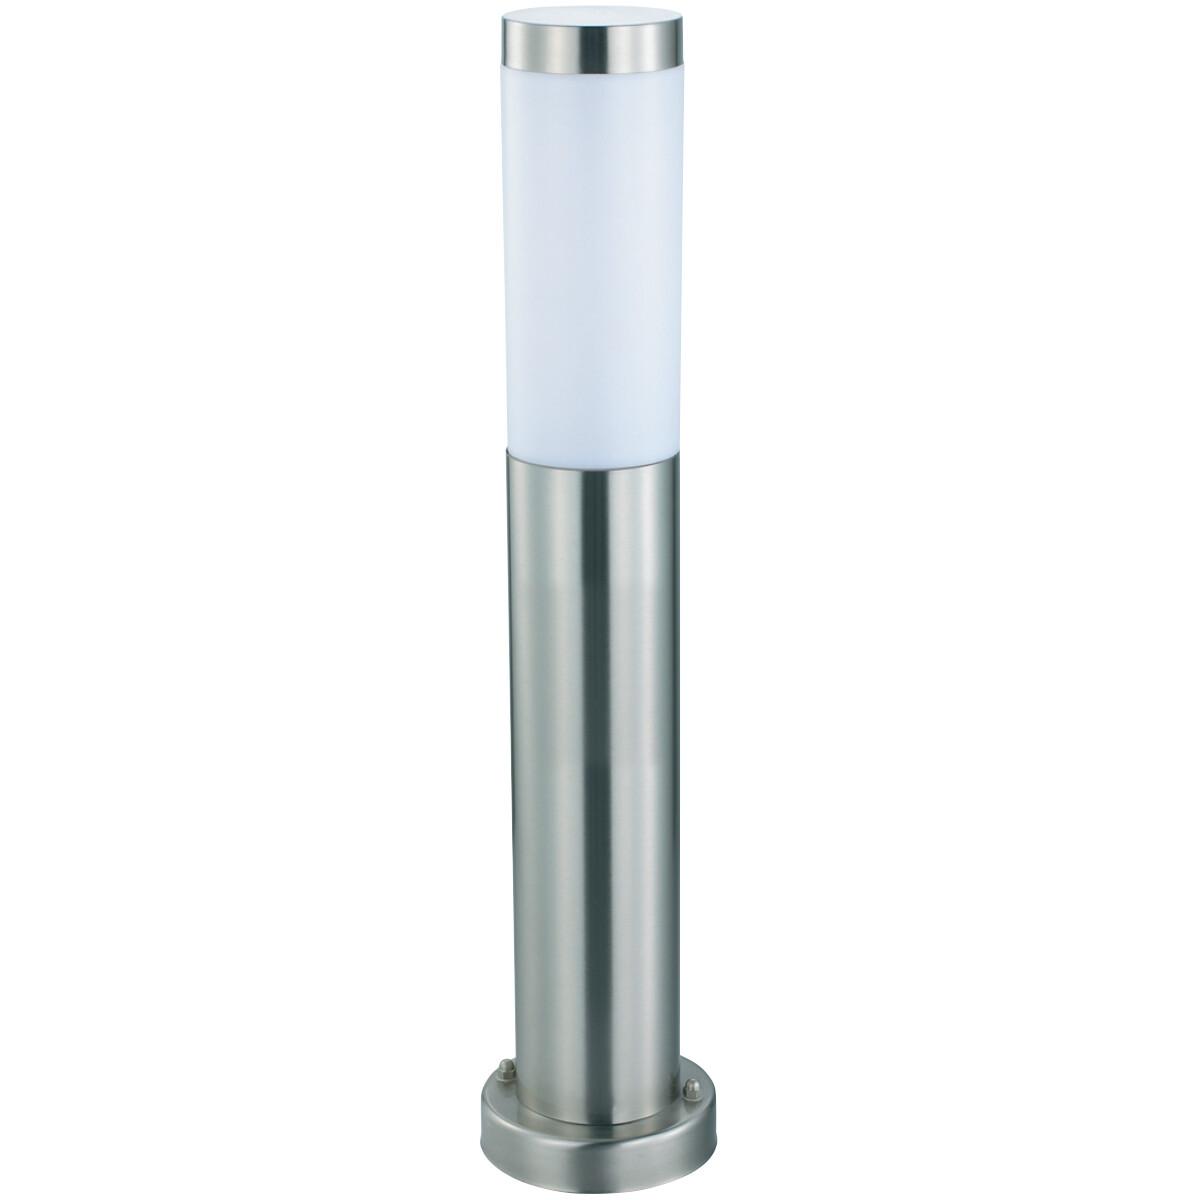 LED Tuinverlichting - Buitenlamp - Laurea 4 - Staand - RVS - E27 - Rond